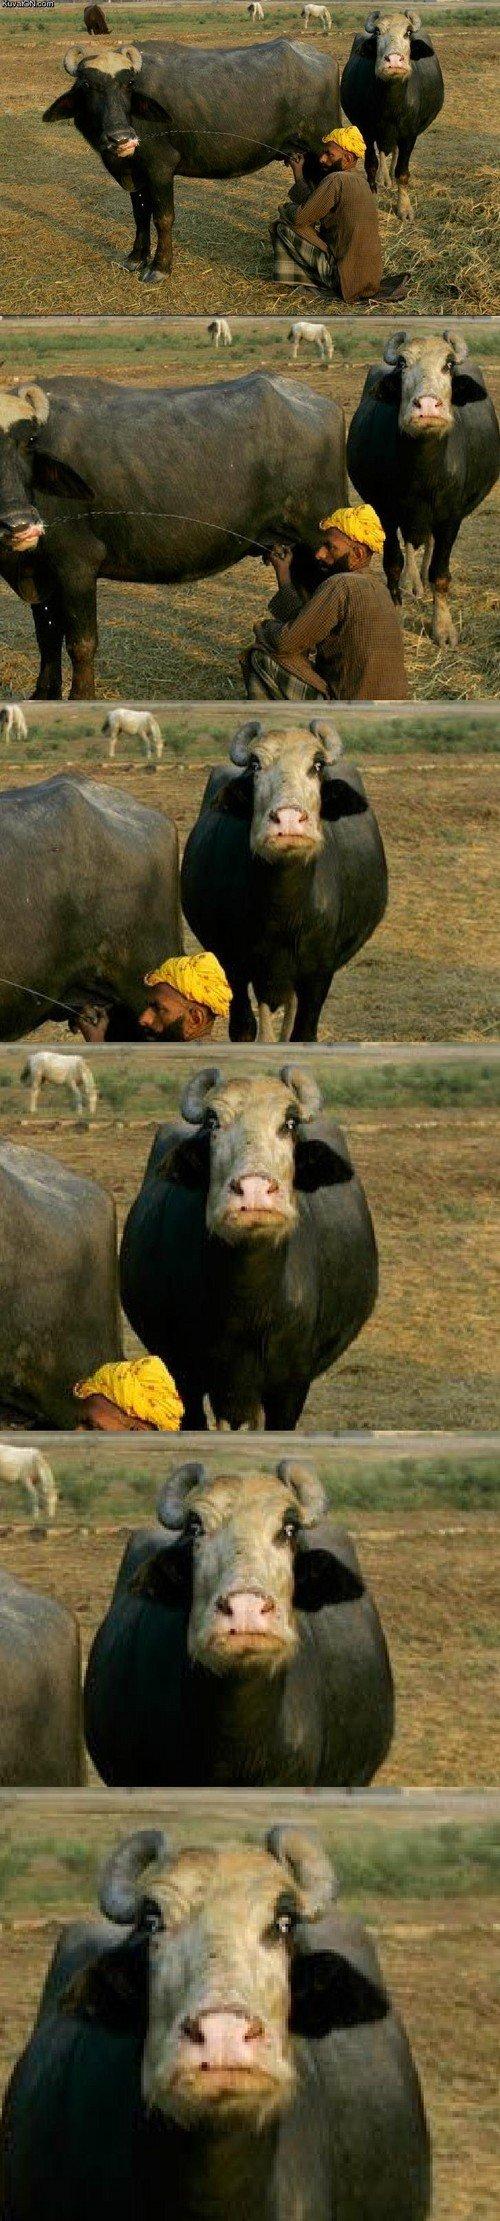 Intense cow. Save FJ. iam